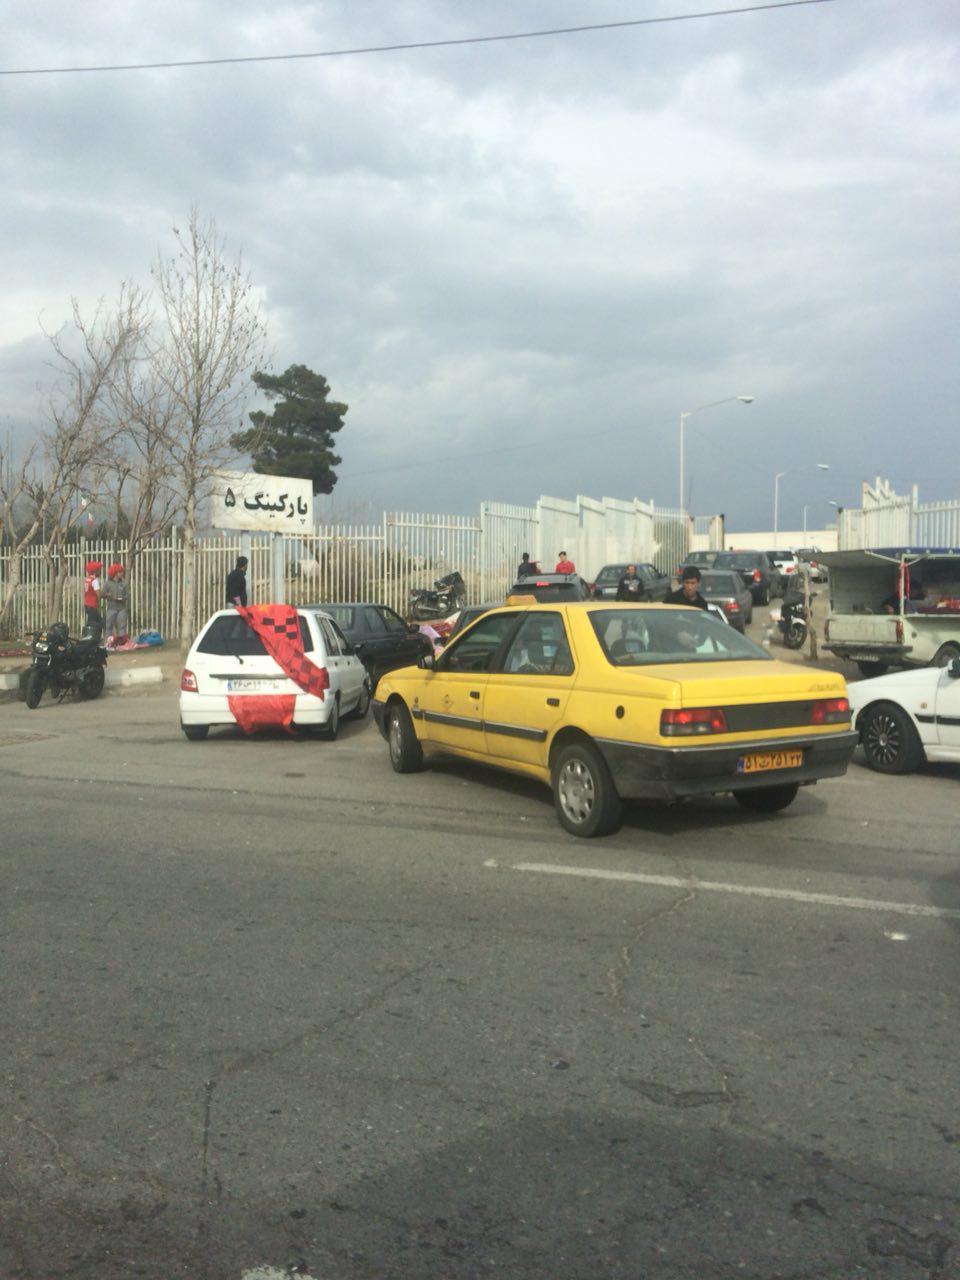 گزارش لحظه به لحظه دیدار پرسپولیس - الوصل امارات